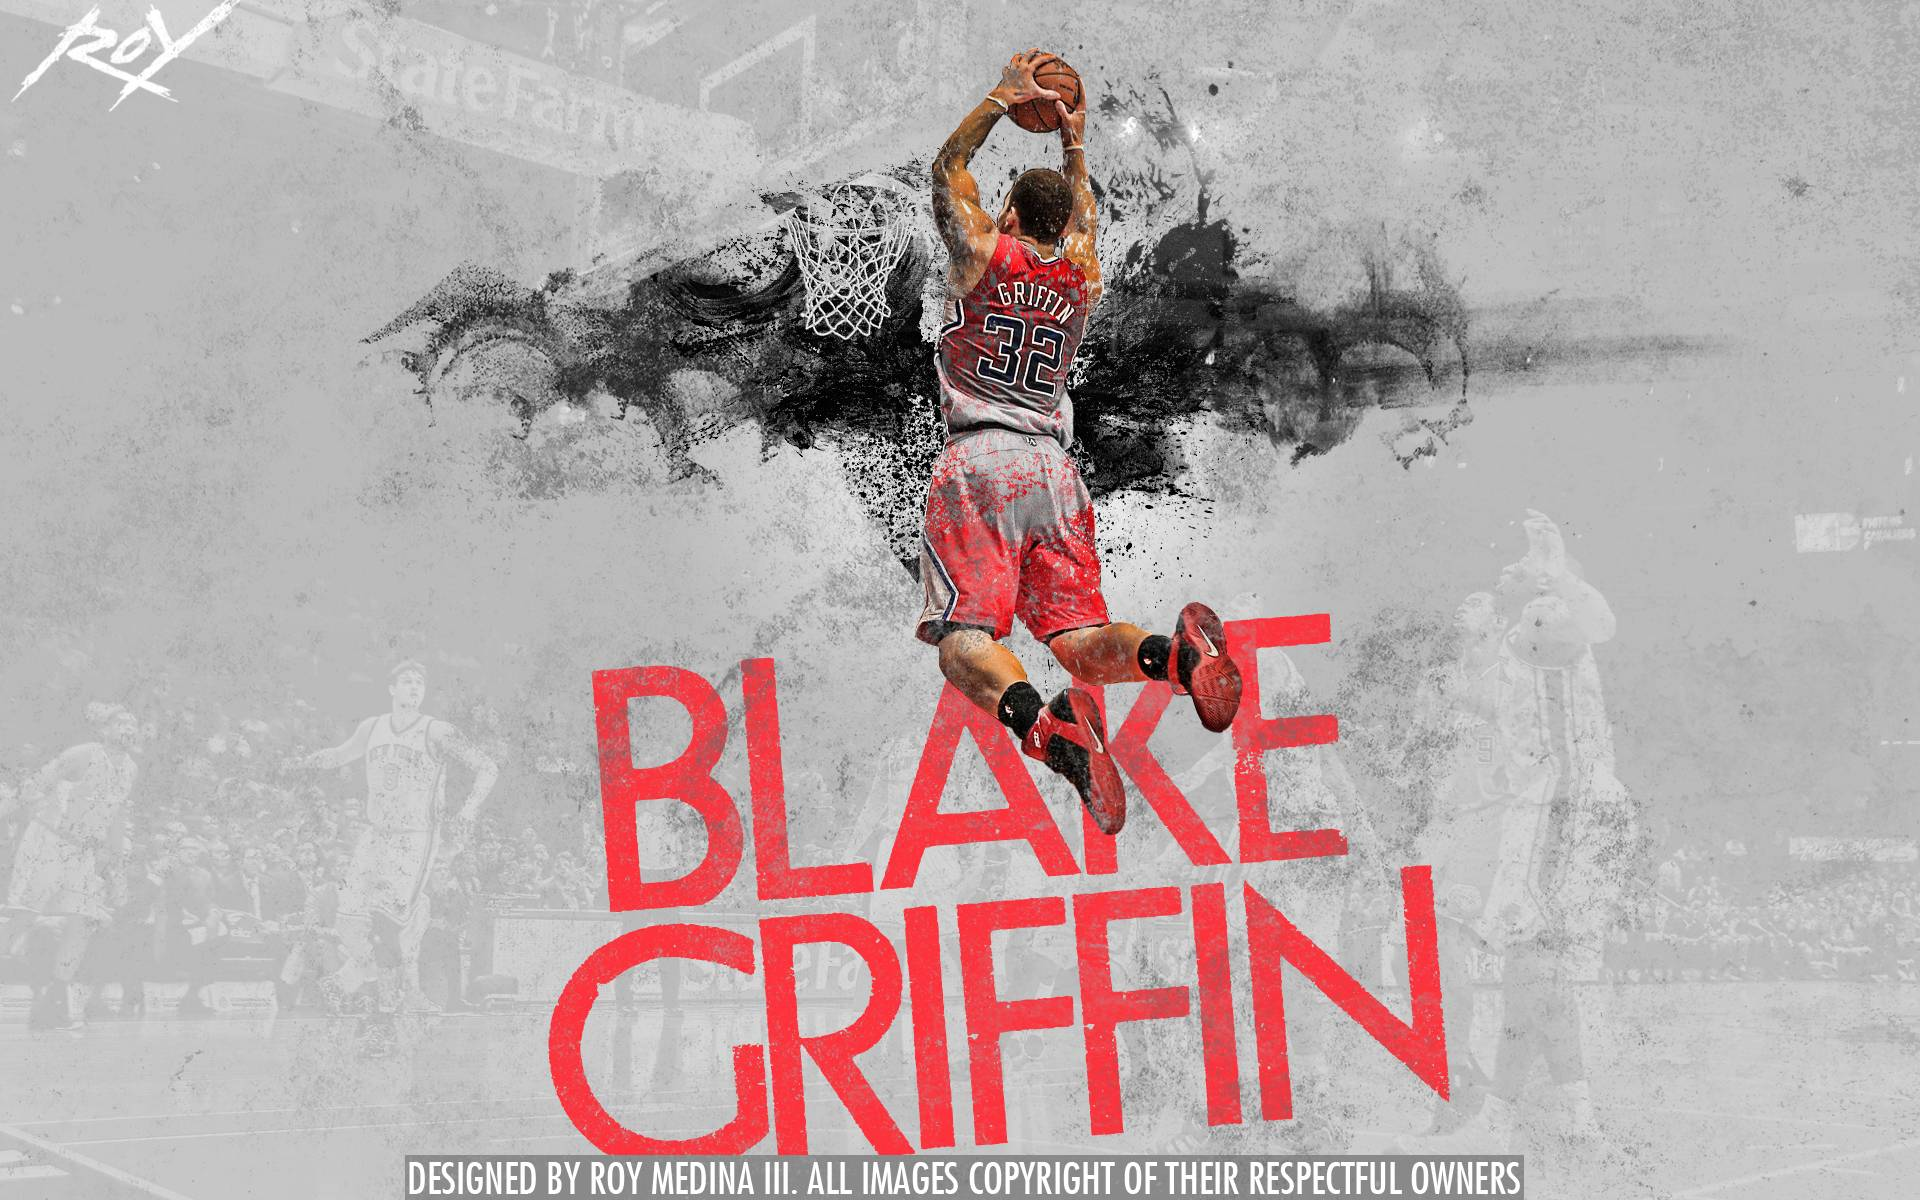 blake griffin wallpaper - photo #8